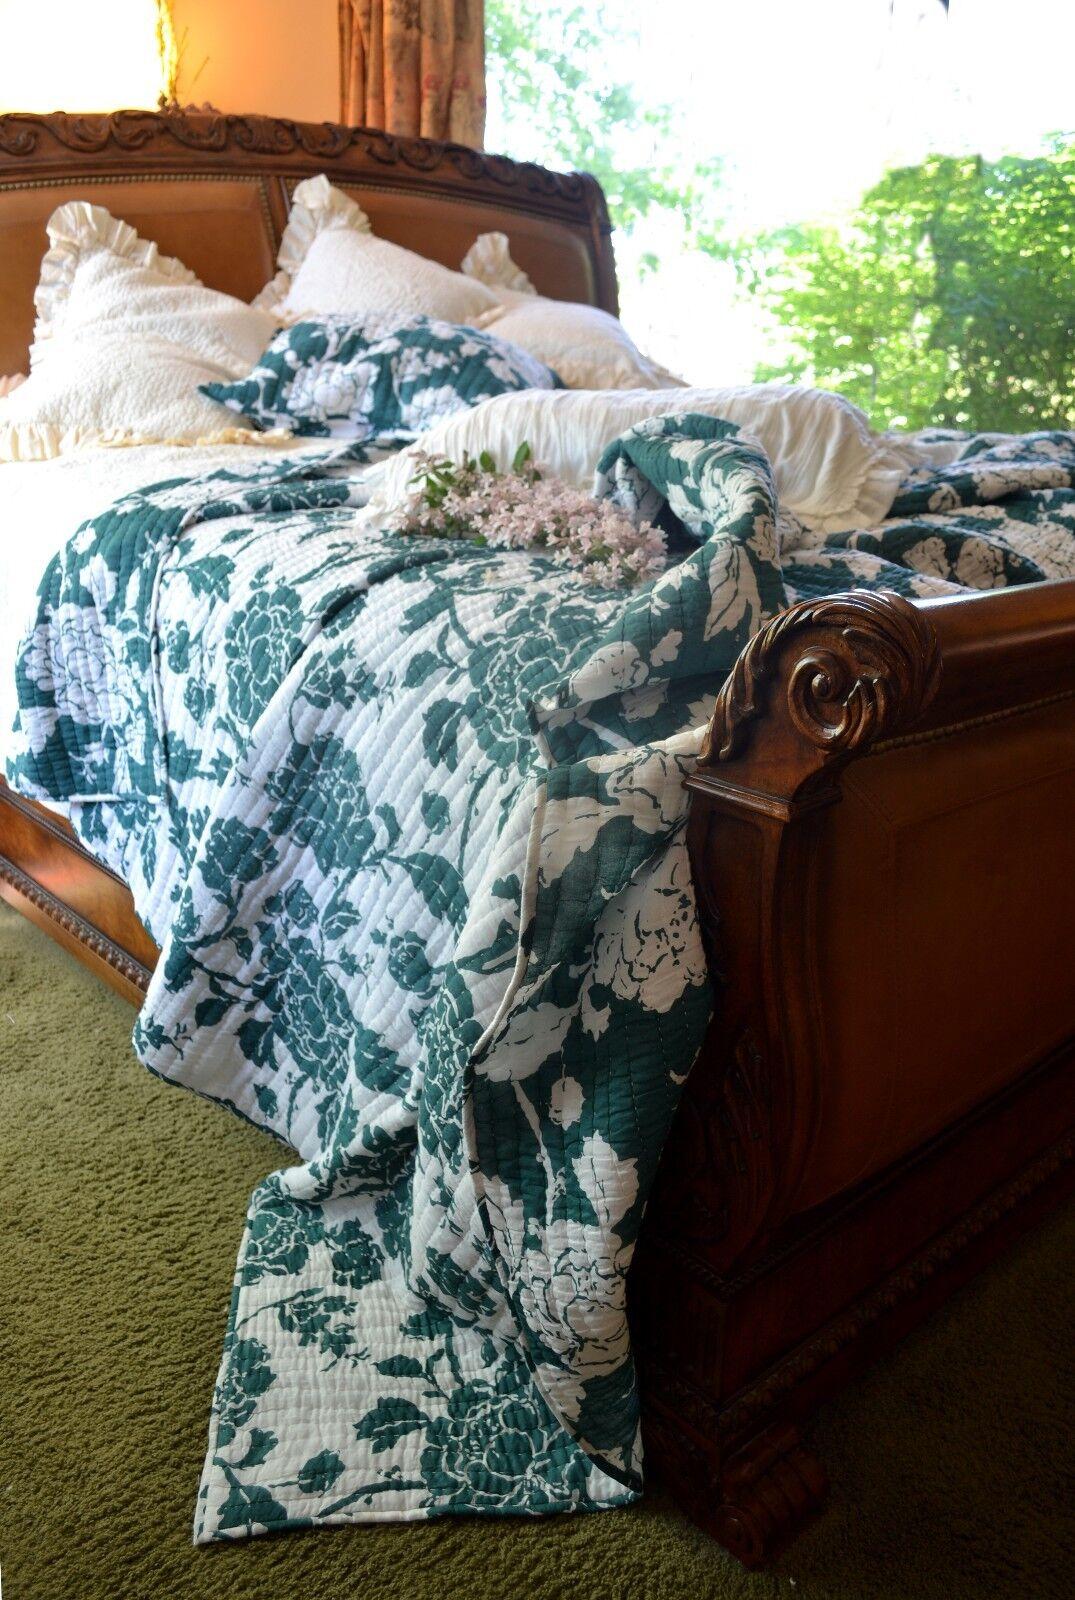 Sample for Soft Surroundings Floral Handmade Reversible Quilt Queen Teal + Sham